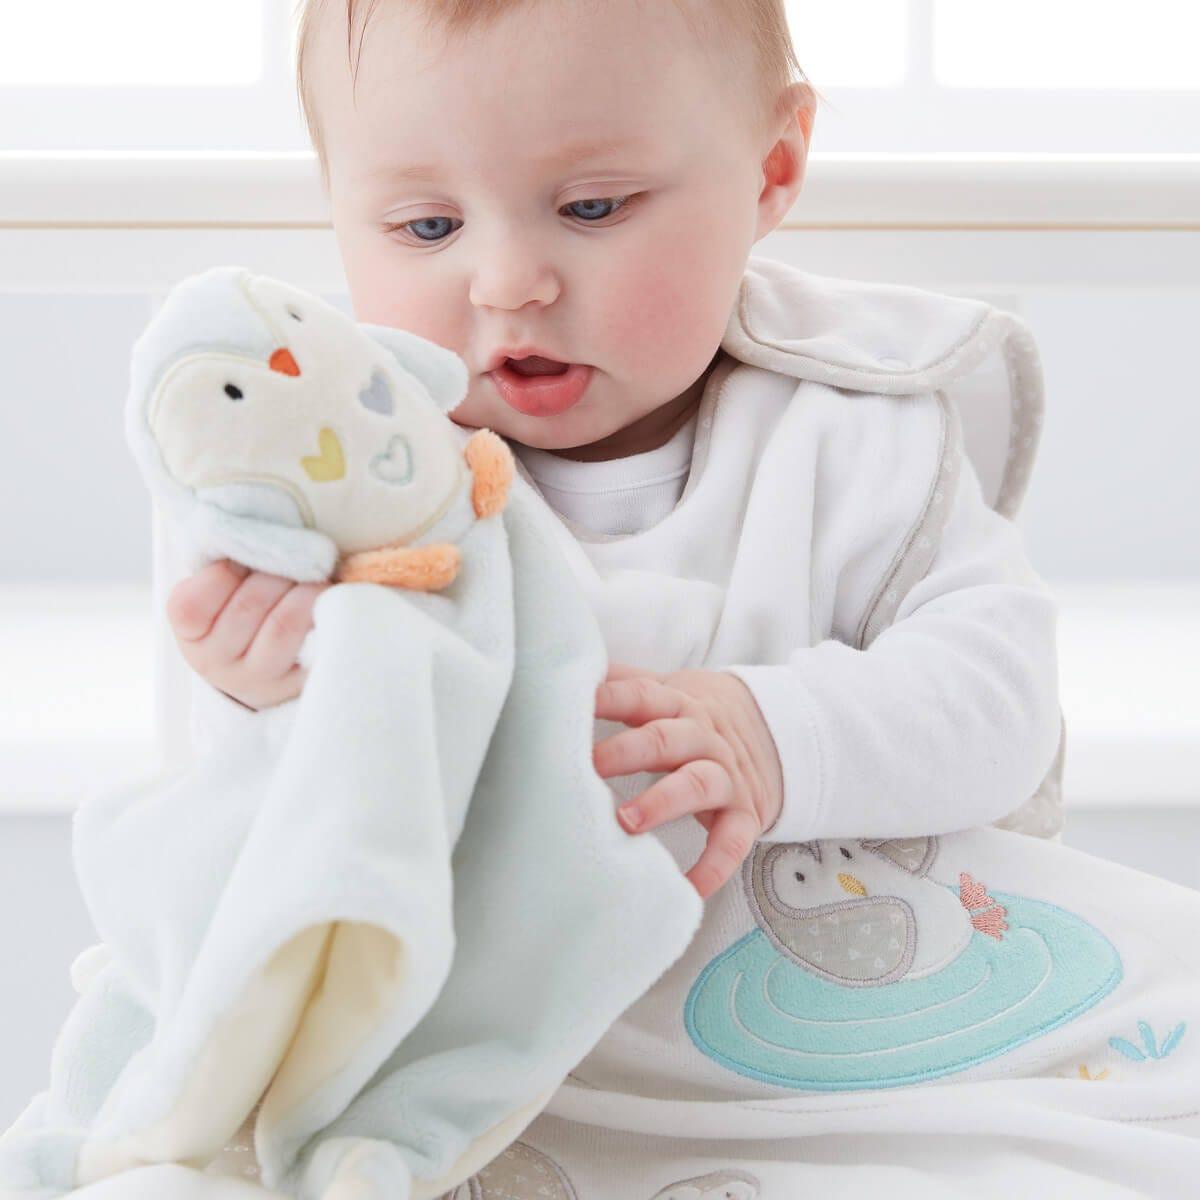 baby-in-gro-bag-holding-percy-gro-comforter